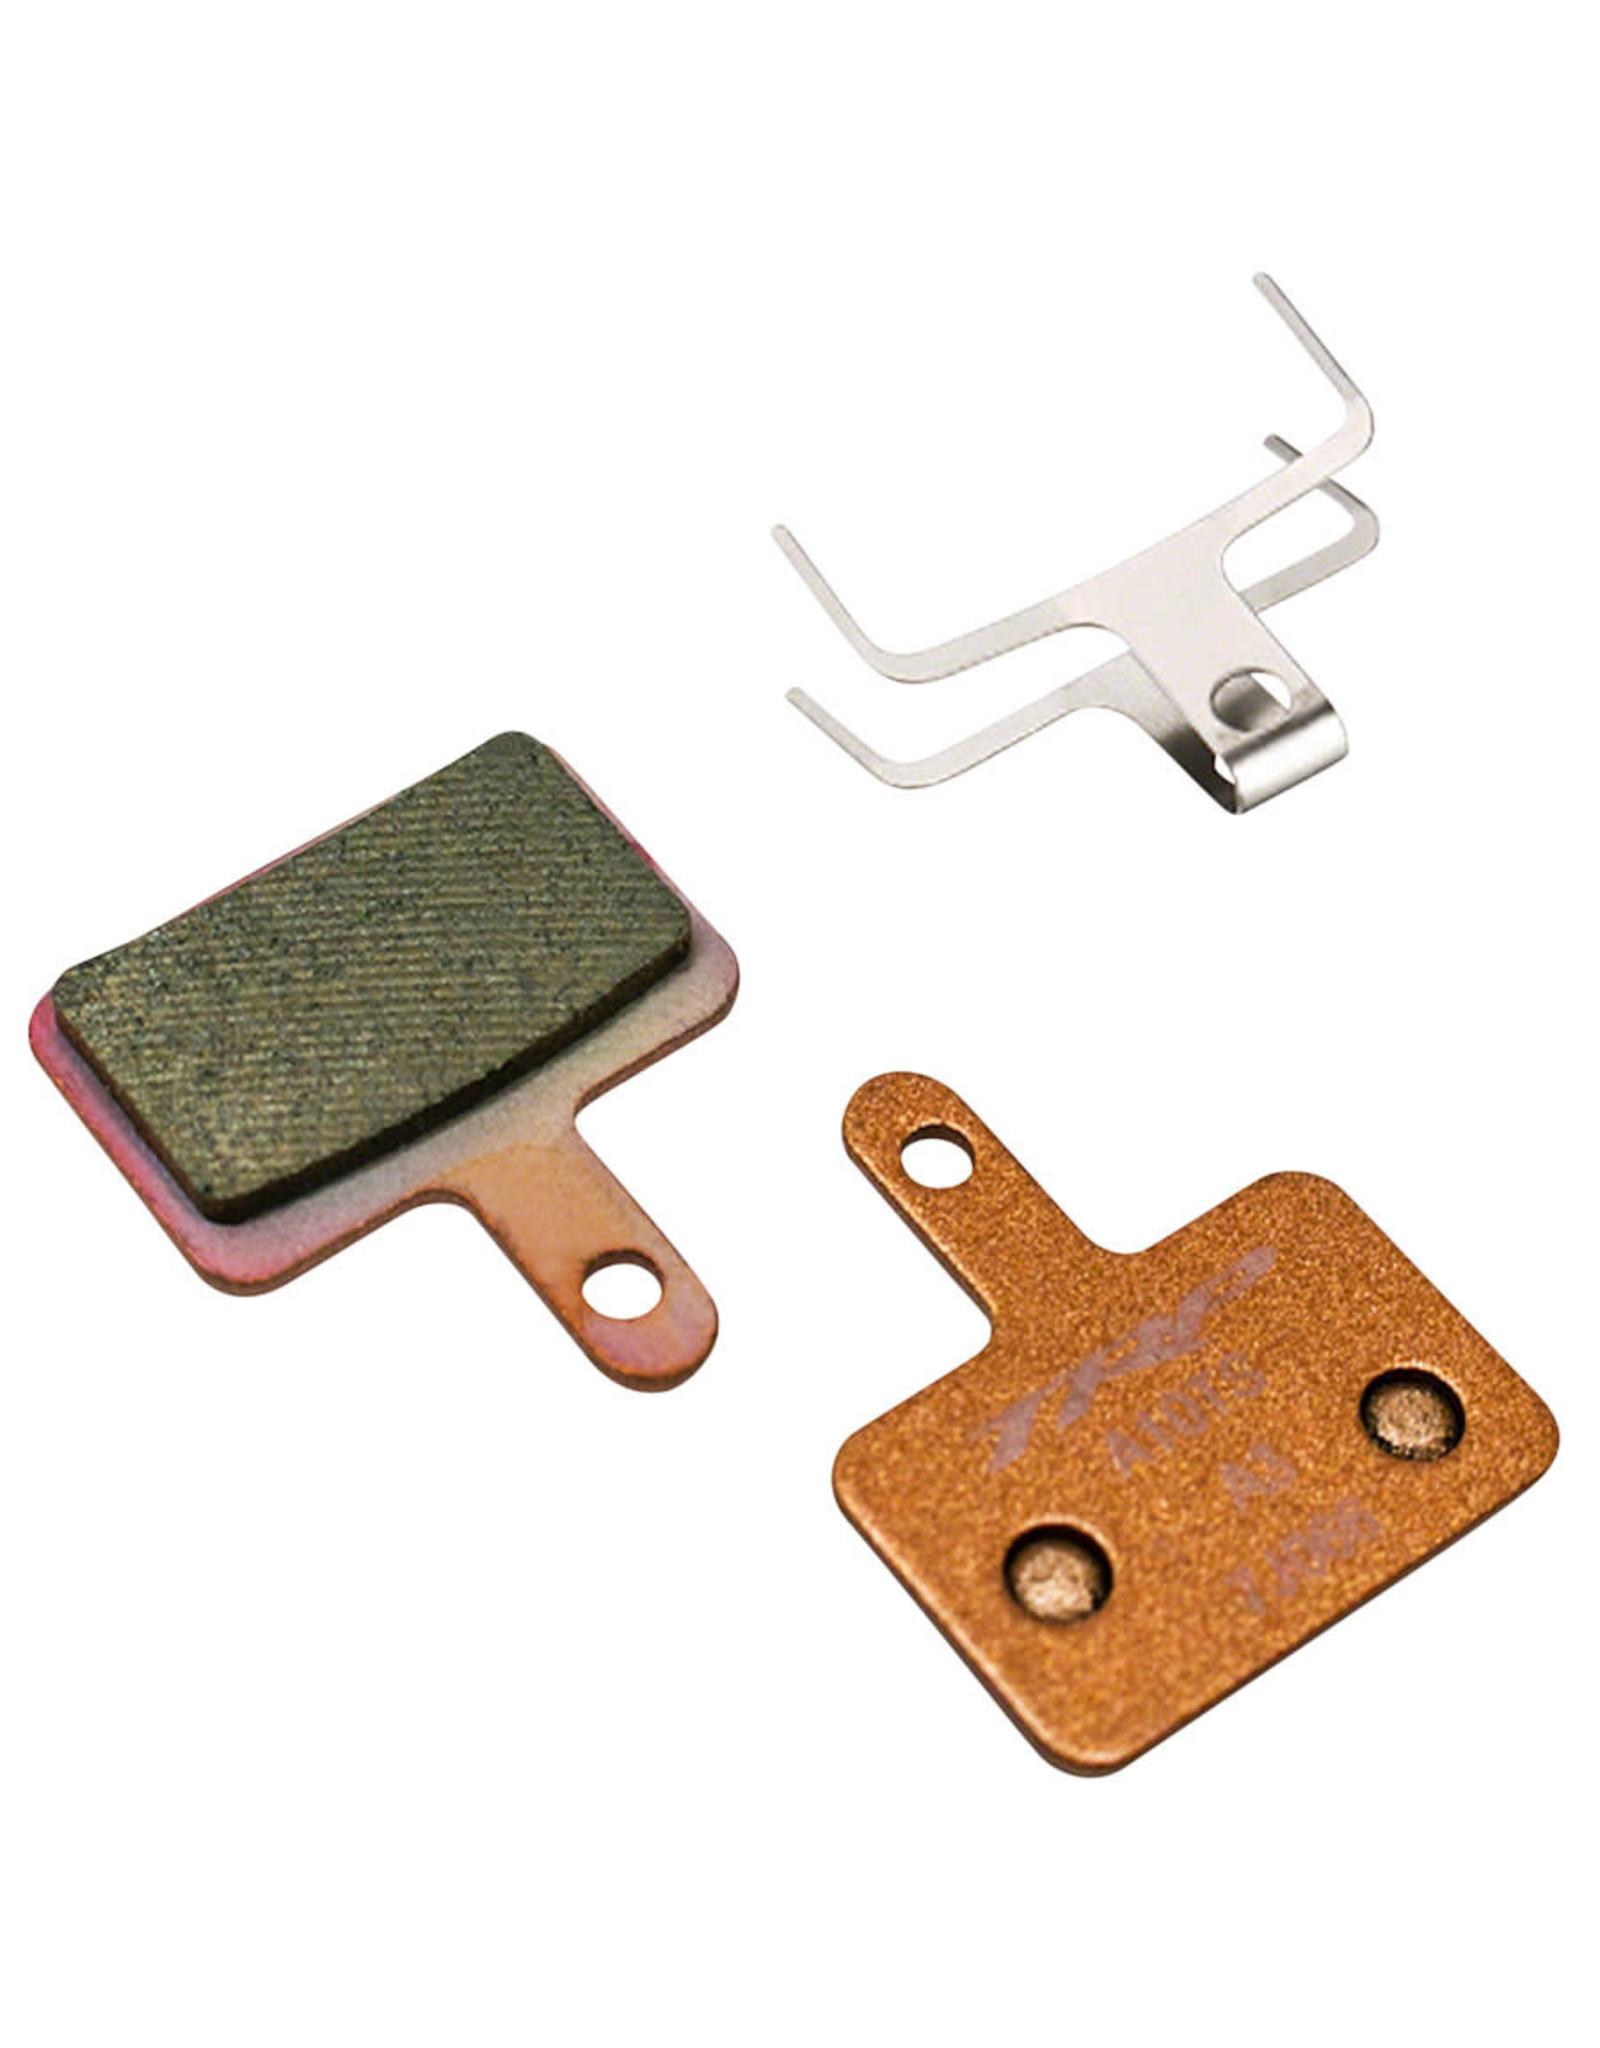 TRP TRP A10TS Disc Brake Pad - Sintered, For TRP Hylex PM, HY/RD, Spyre, Spyke